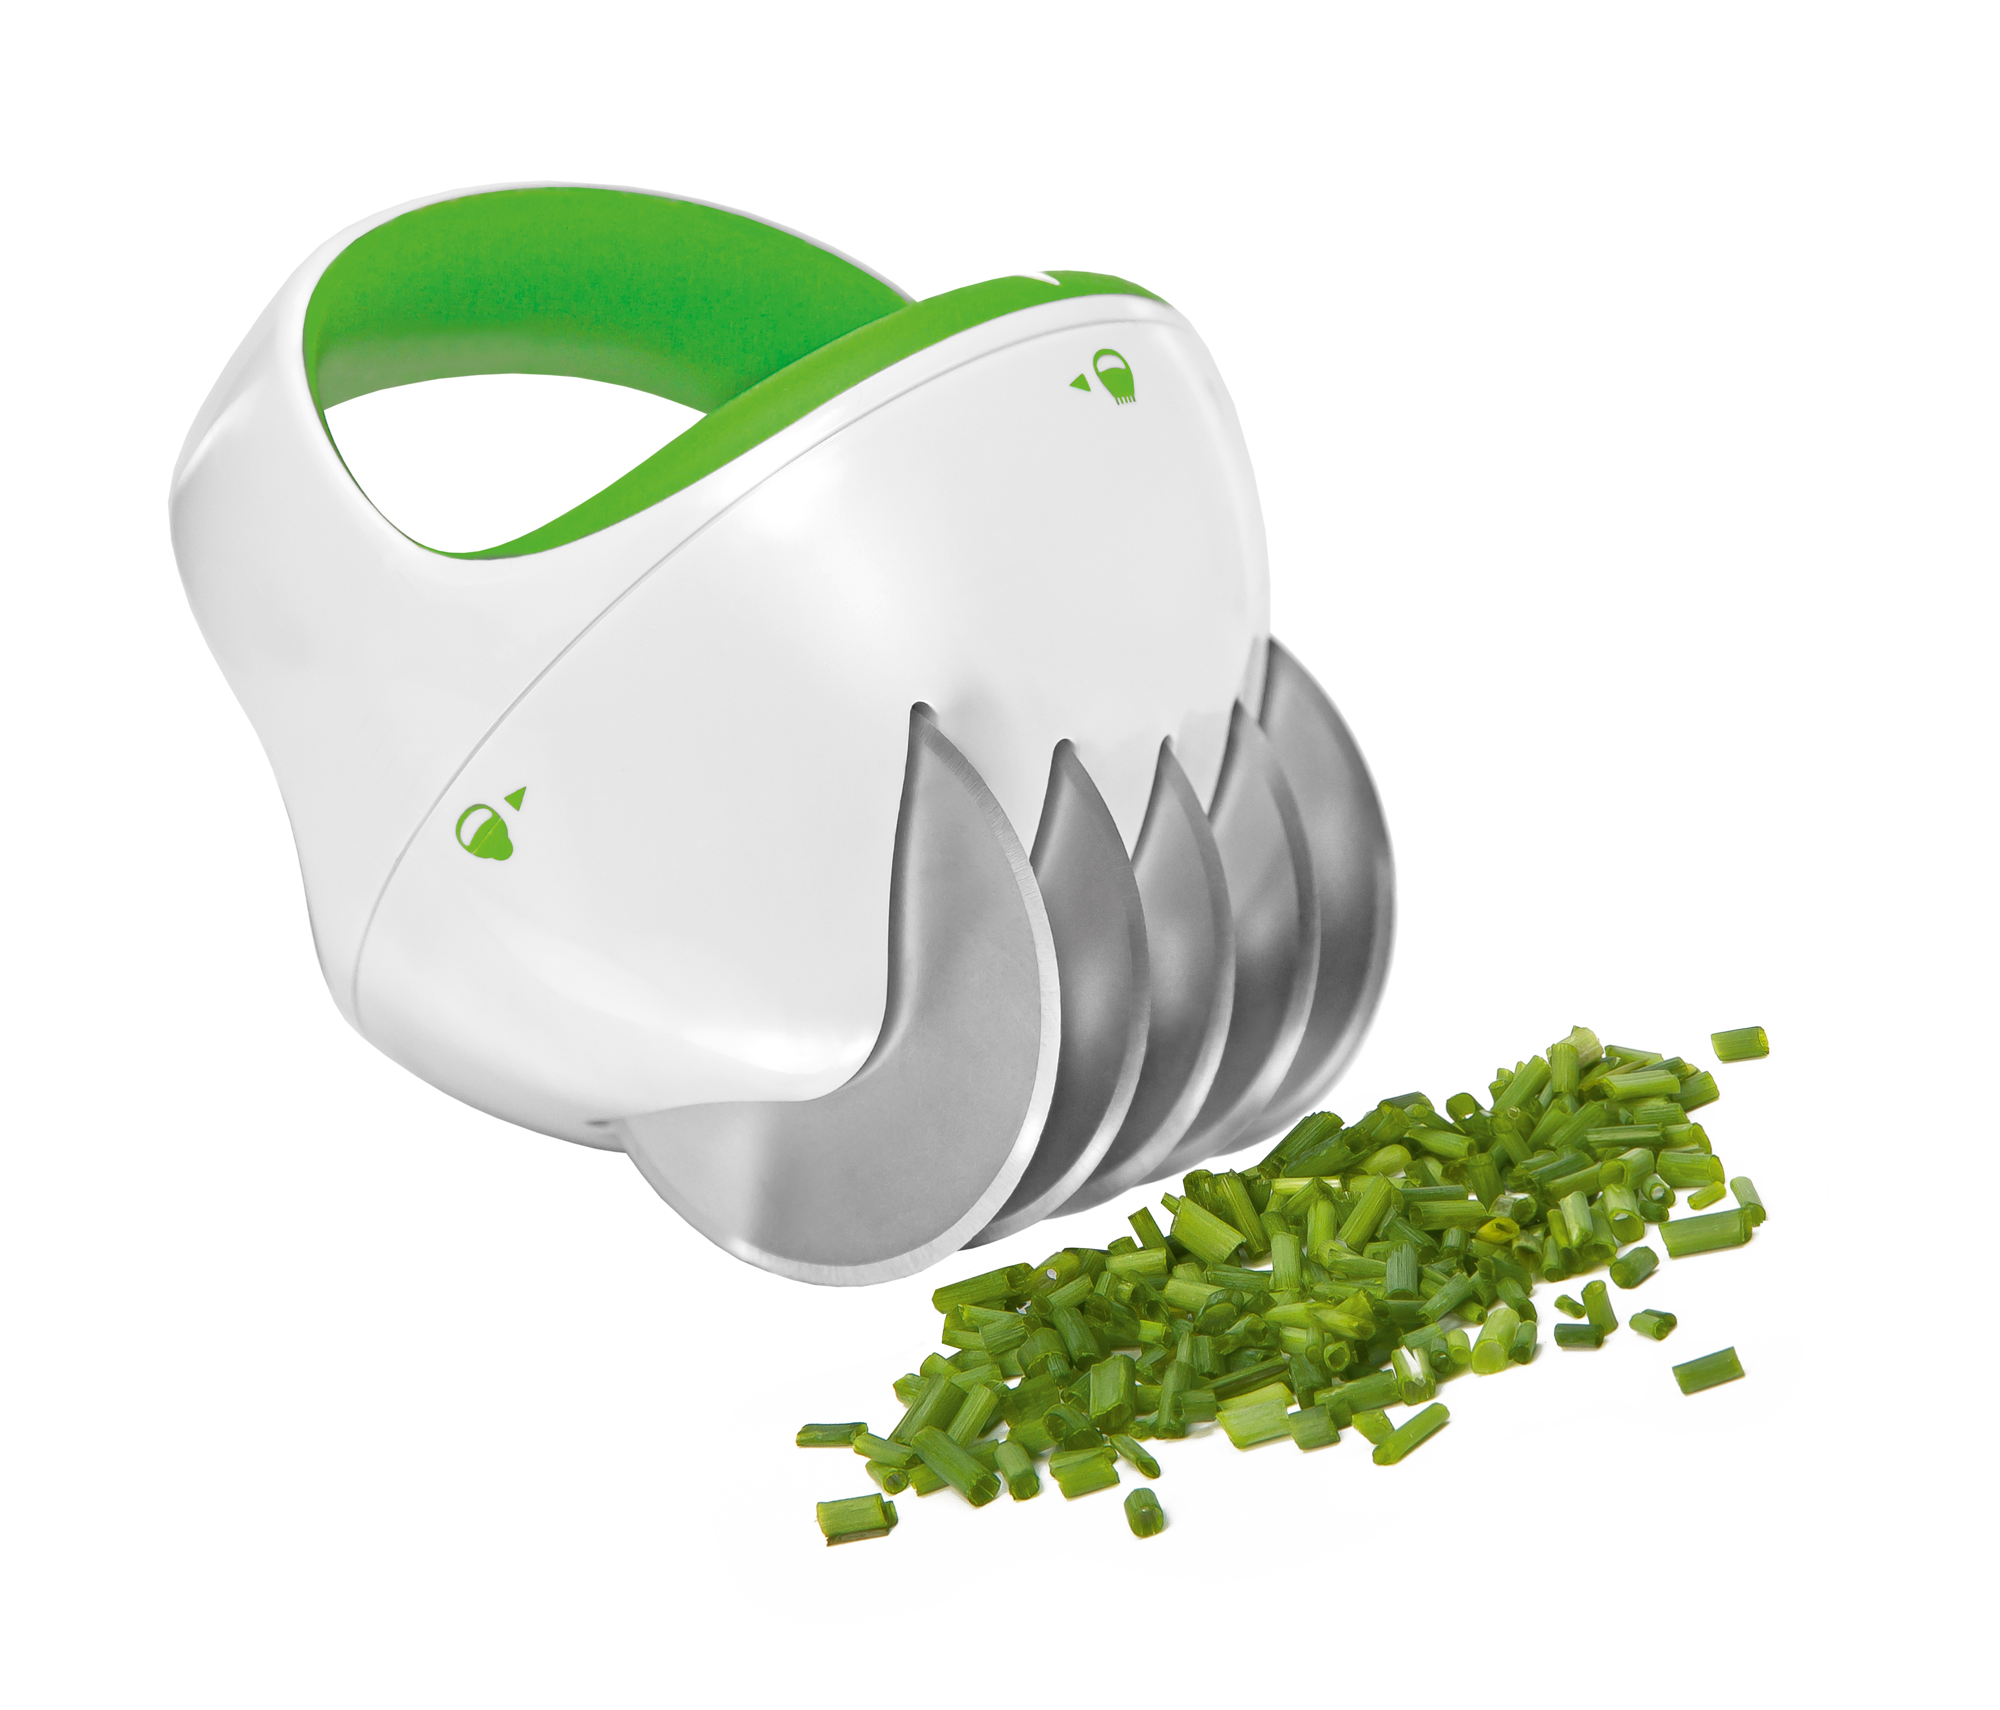 Zyliss Fast Cut Herb Tool. DK Brands